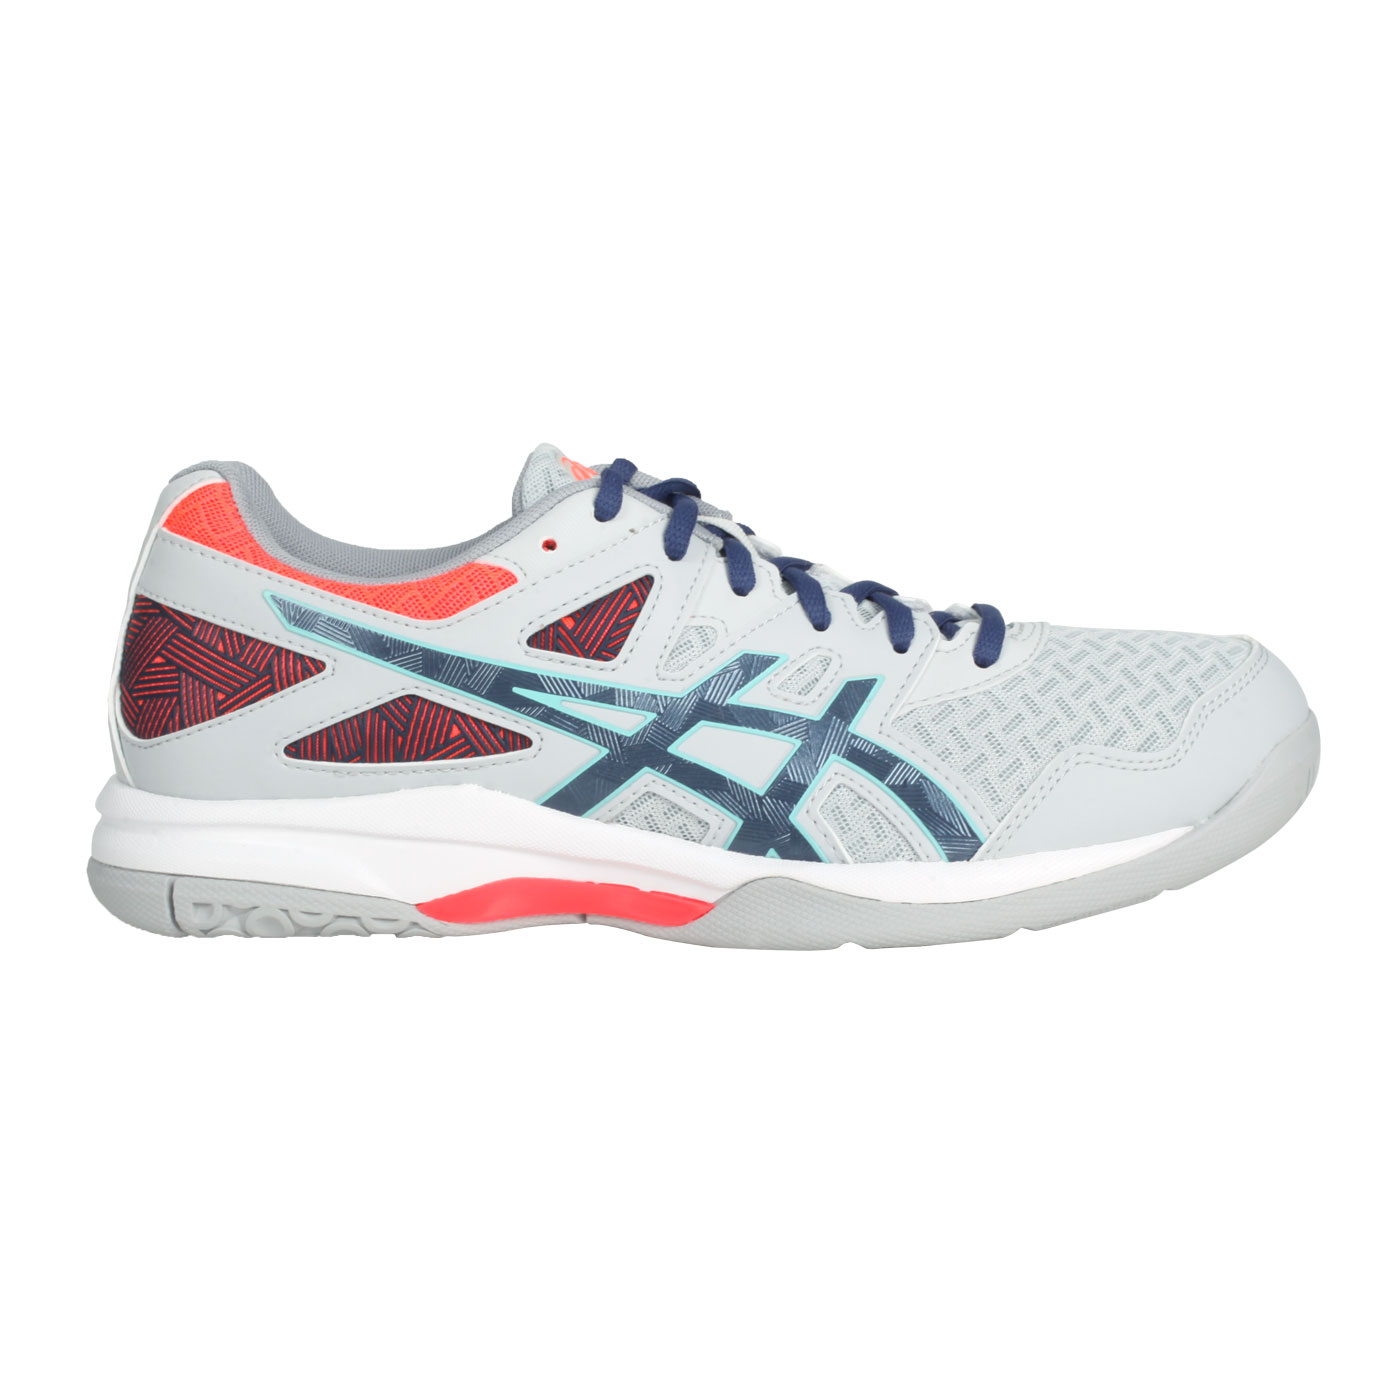 ASICS 男款排羽球鞋   @GEL-TASK 2@1071A037-960 - 灰藍橘